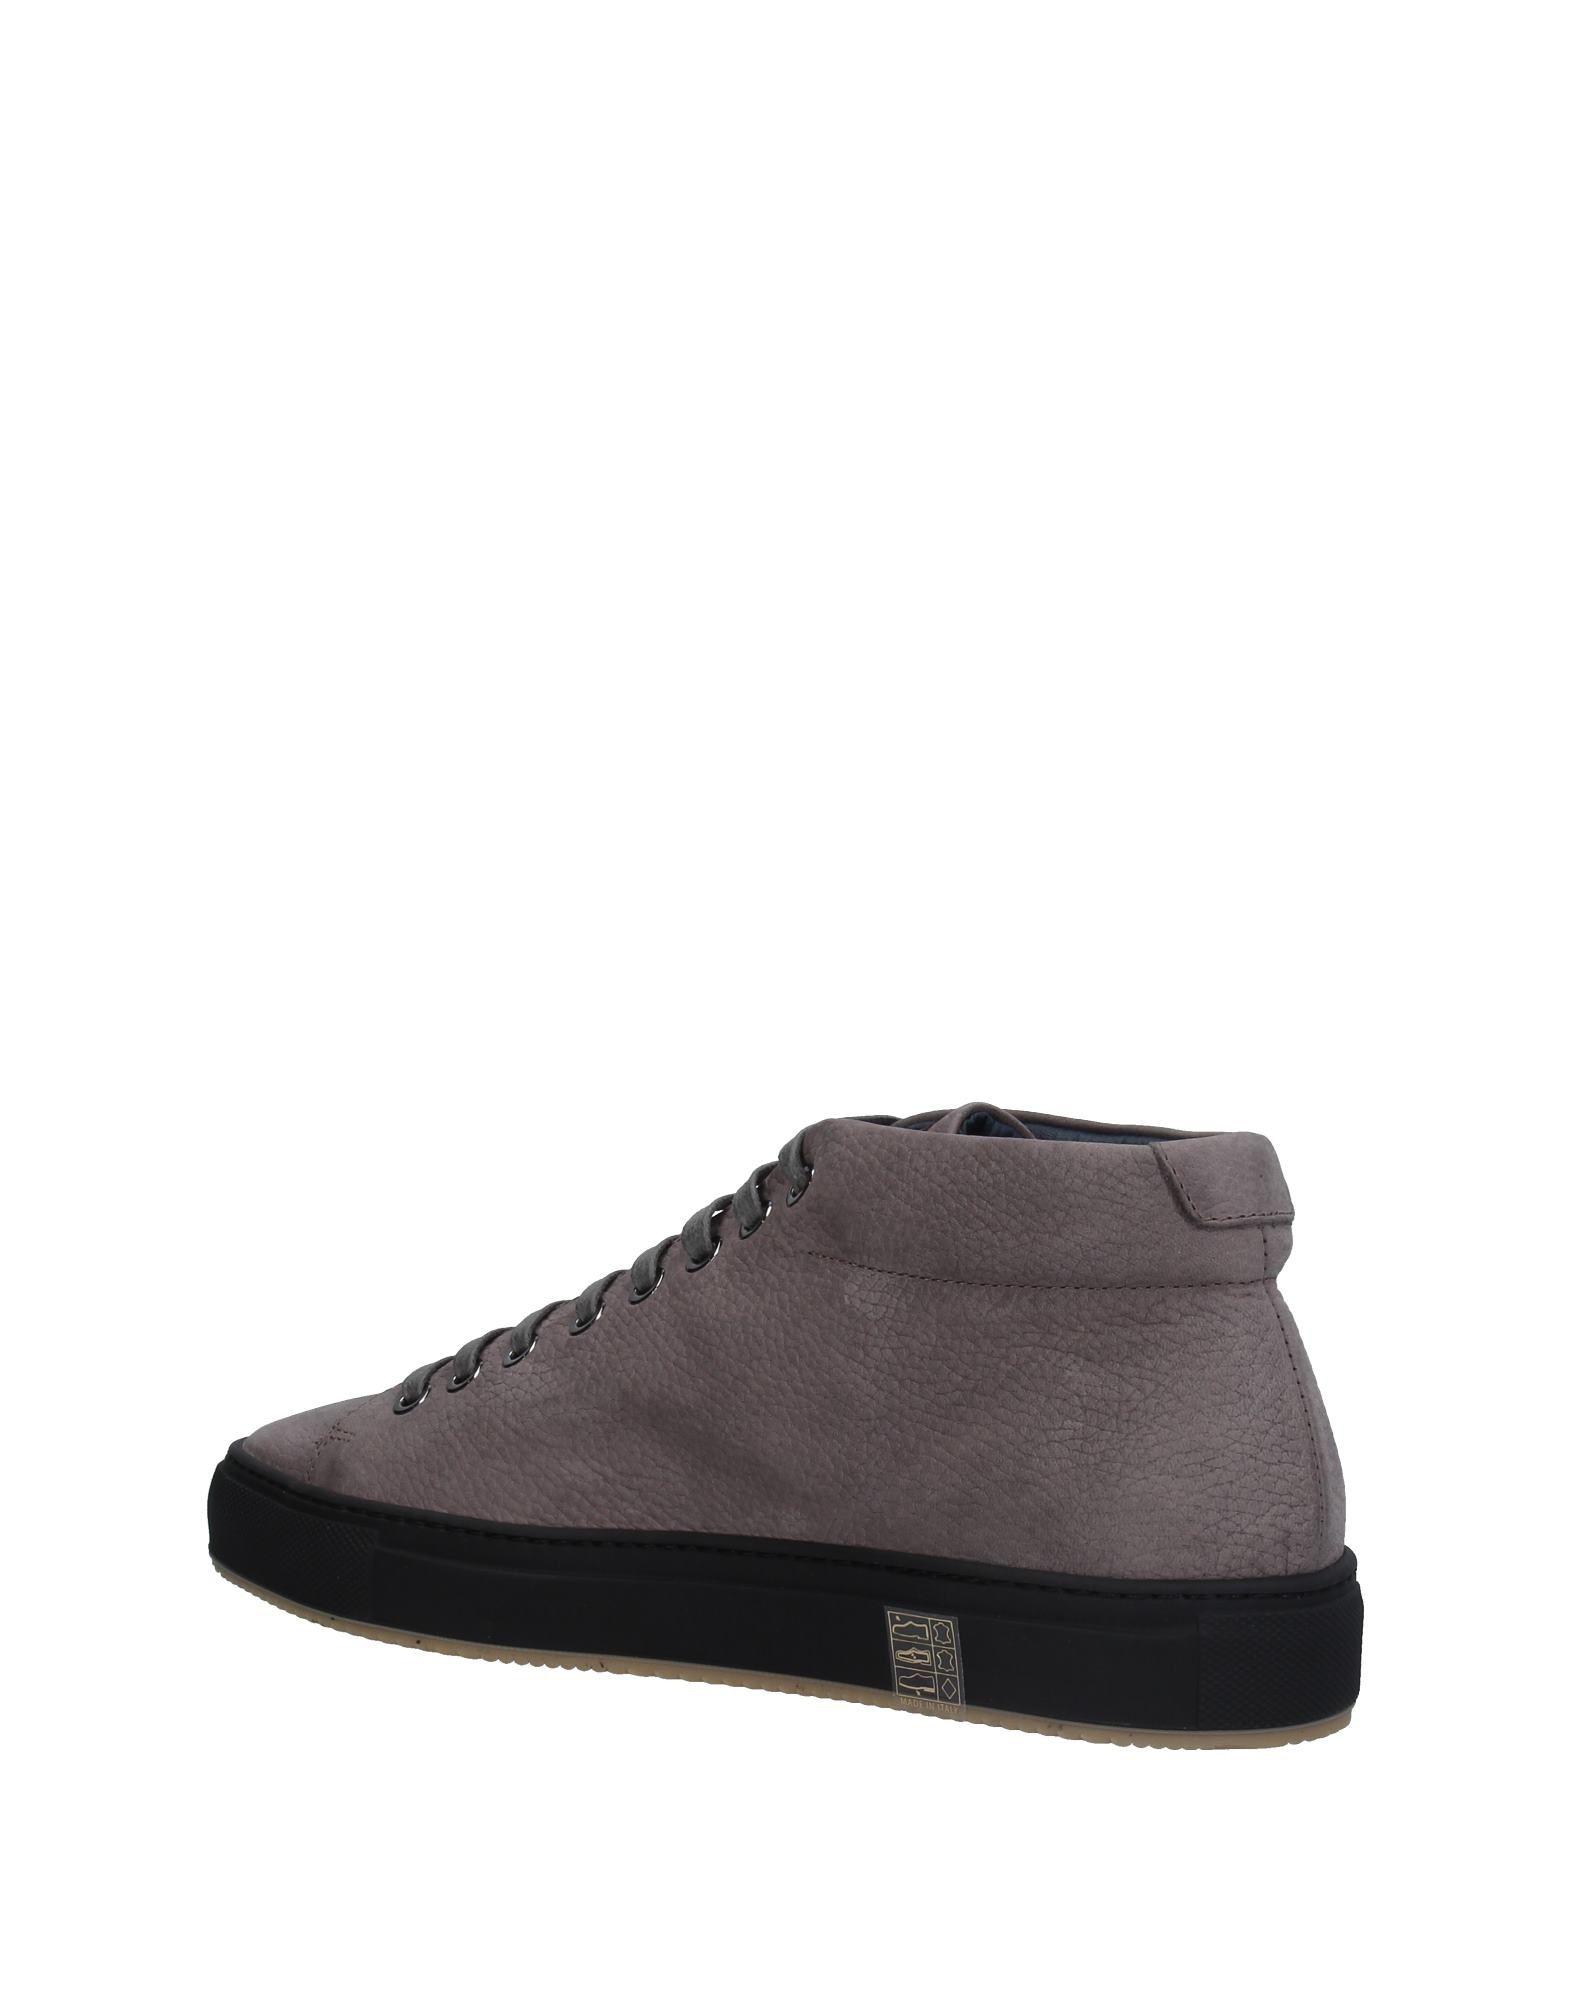 Fabiano Ricci Sneakers Herren   11271551FG b4abe9